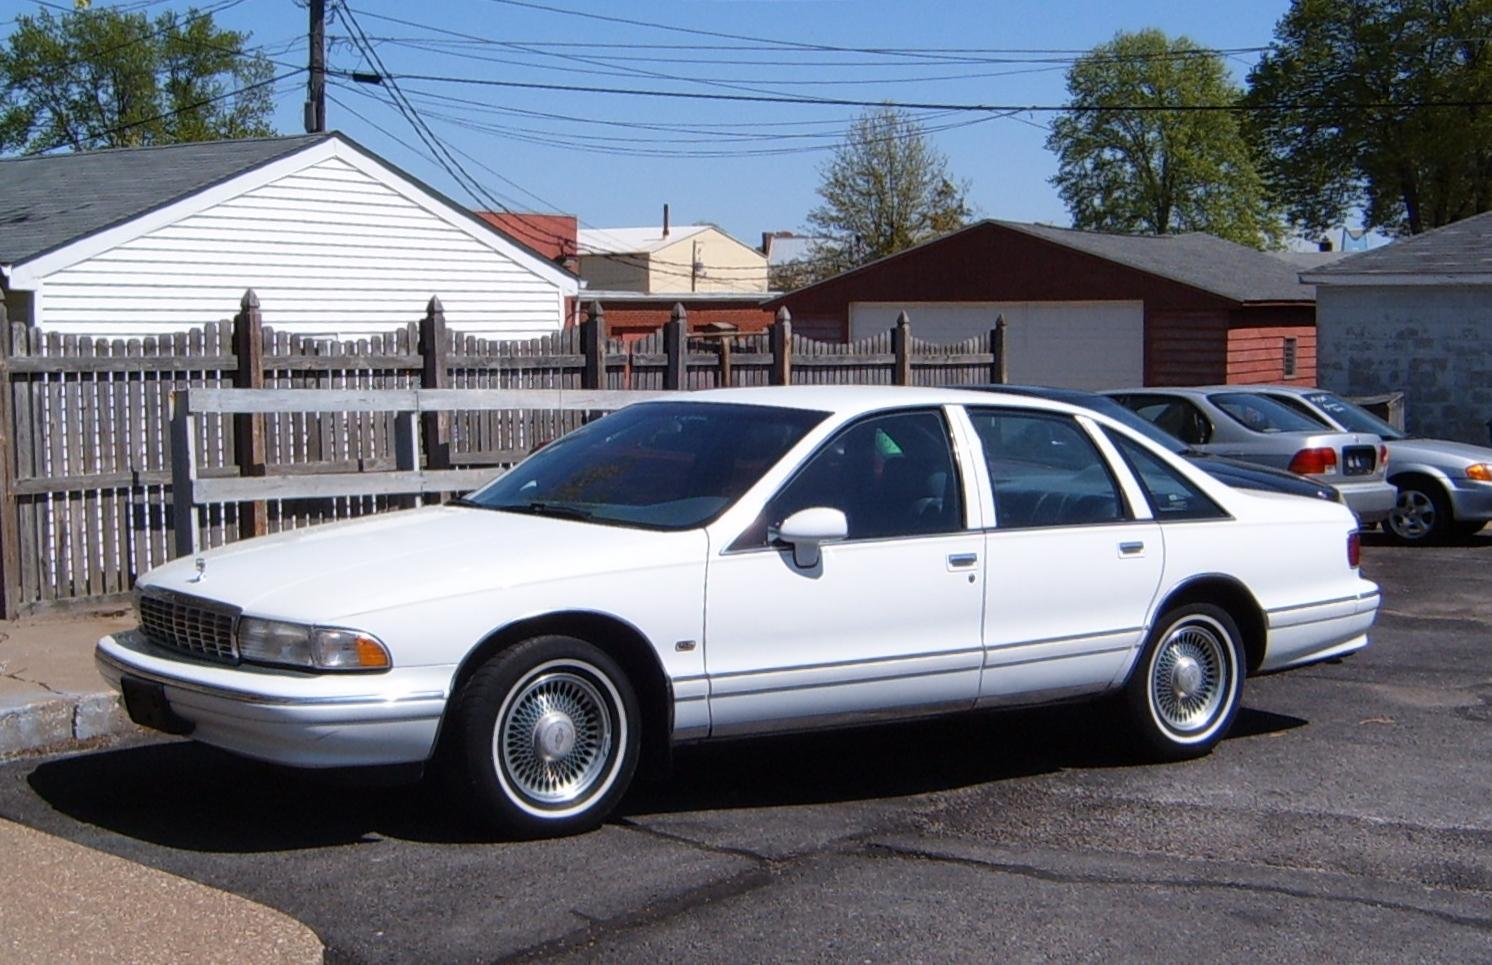 Curbside Classic: 1994 Chevrolet Caprice Classic LS – Last